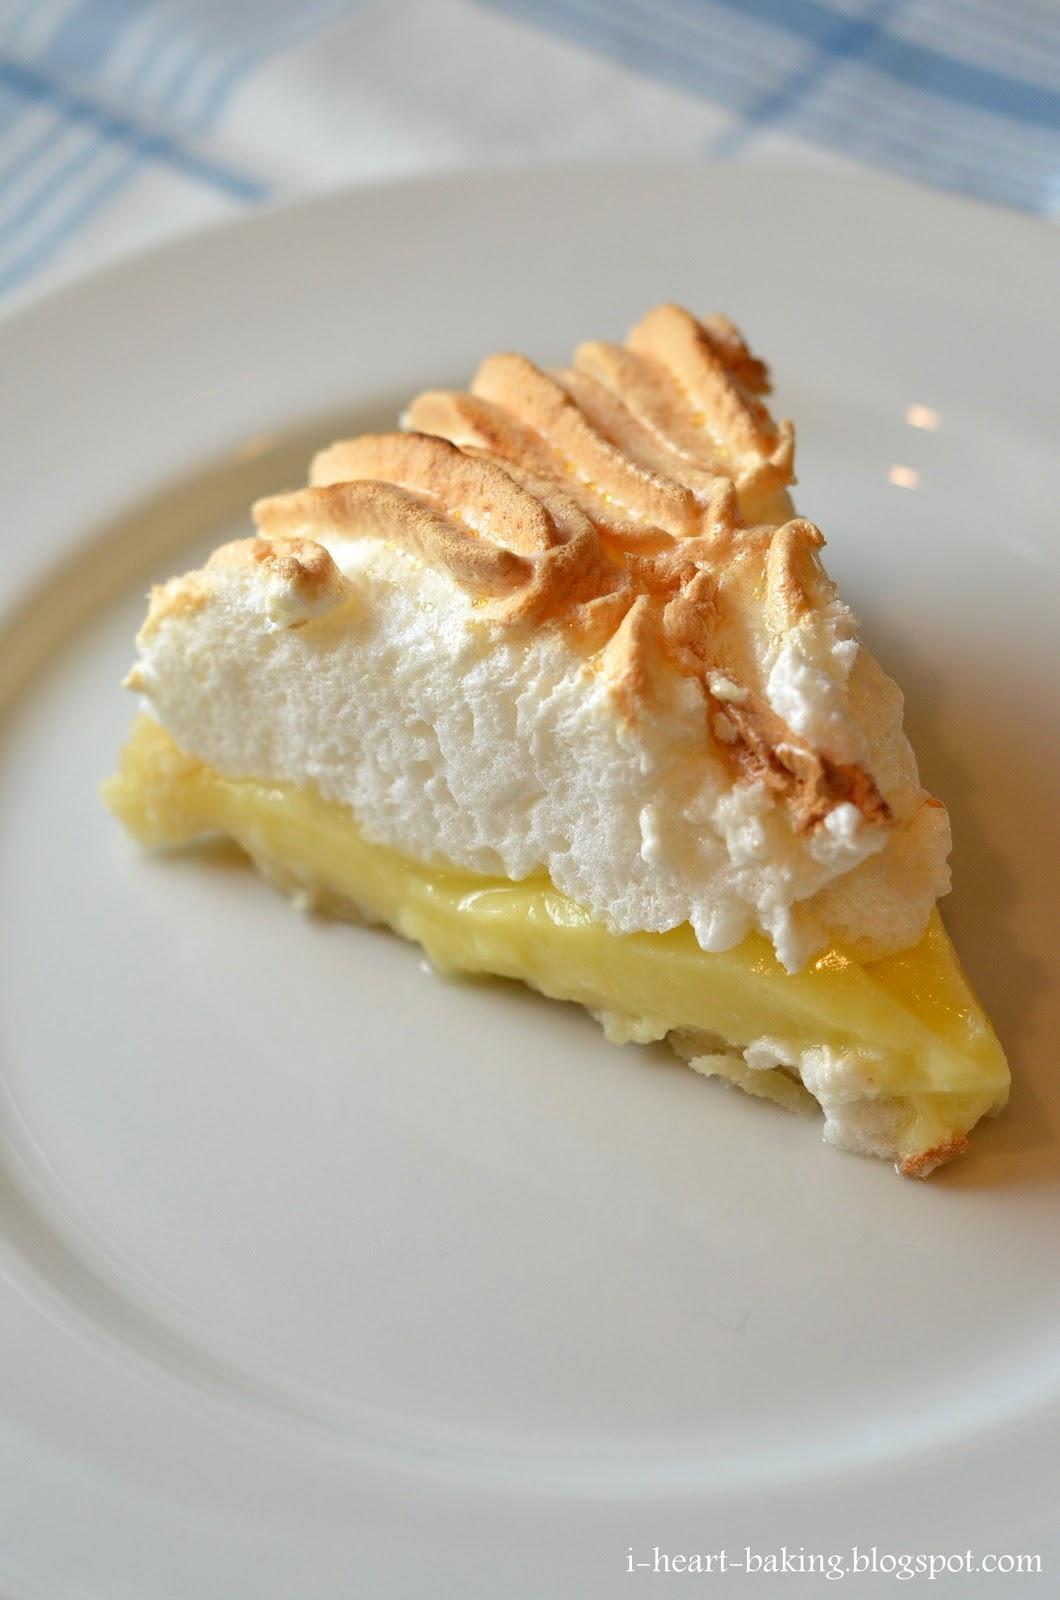 heart baking!: lemon meringue pie